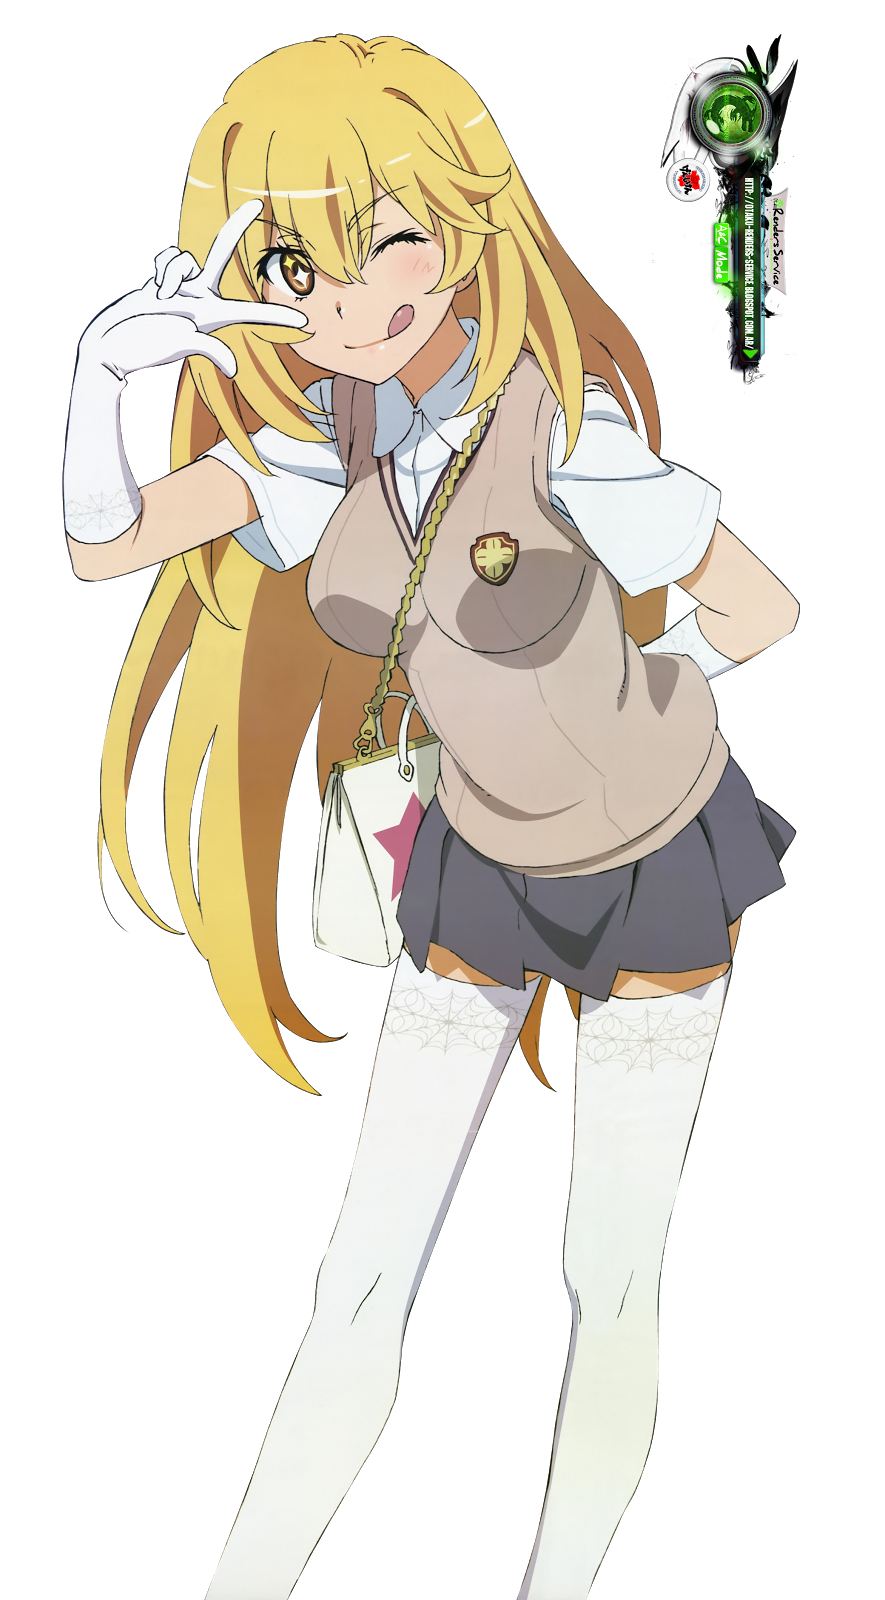 Misaki Shokuhou